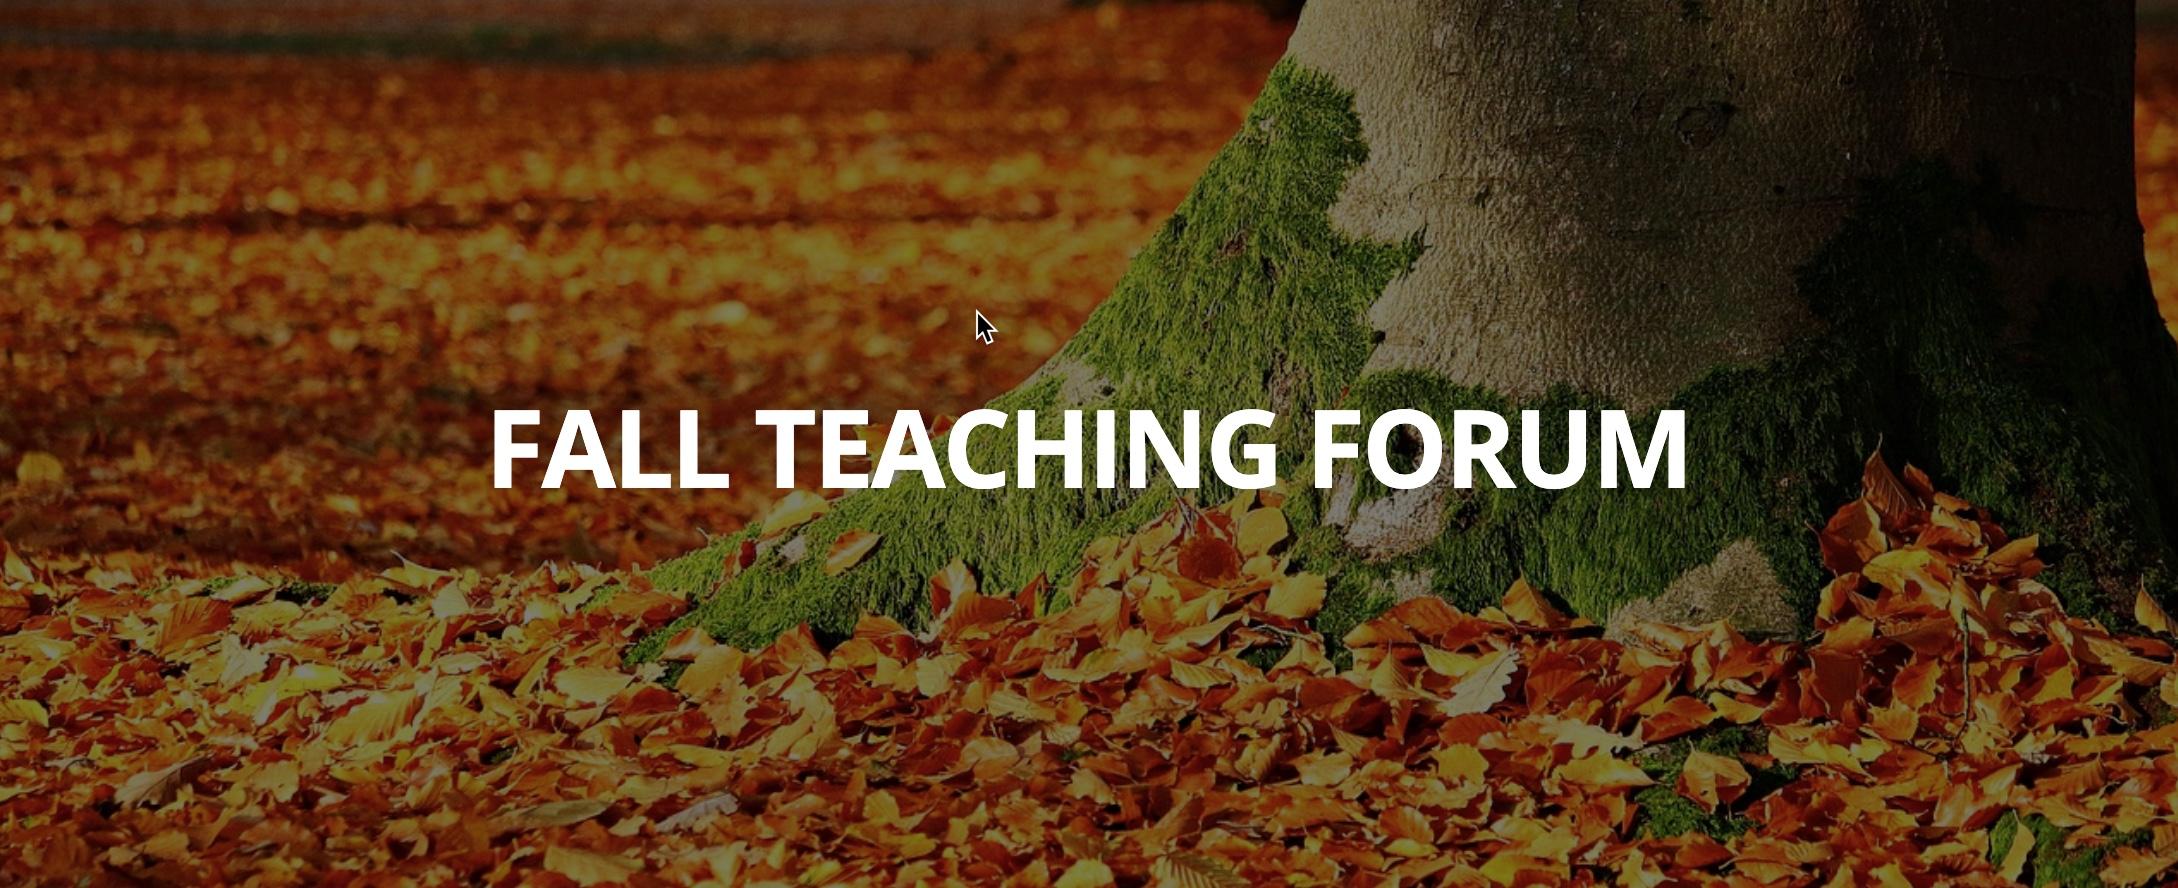 Fall Teaching Forum